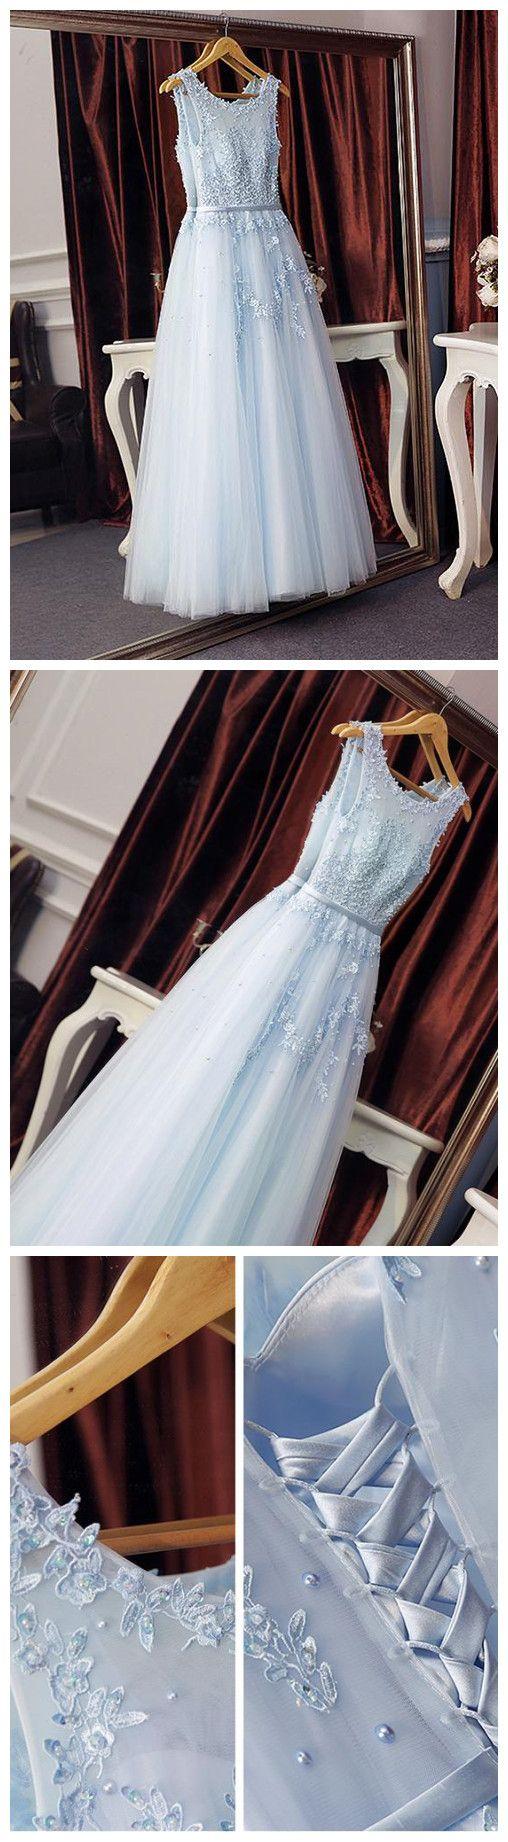 prom dresses long,prom dresses blue,prom dresses a line,prom dresses modest,prom dresses 2018,prom dresses tulle,prom dresses applique #scoop #tulle #cheap #2018